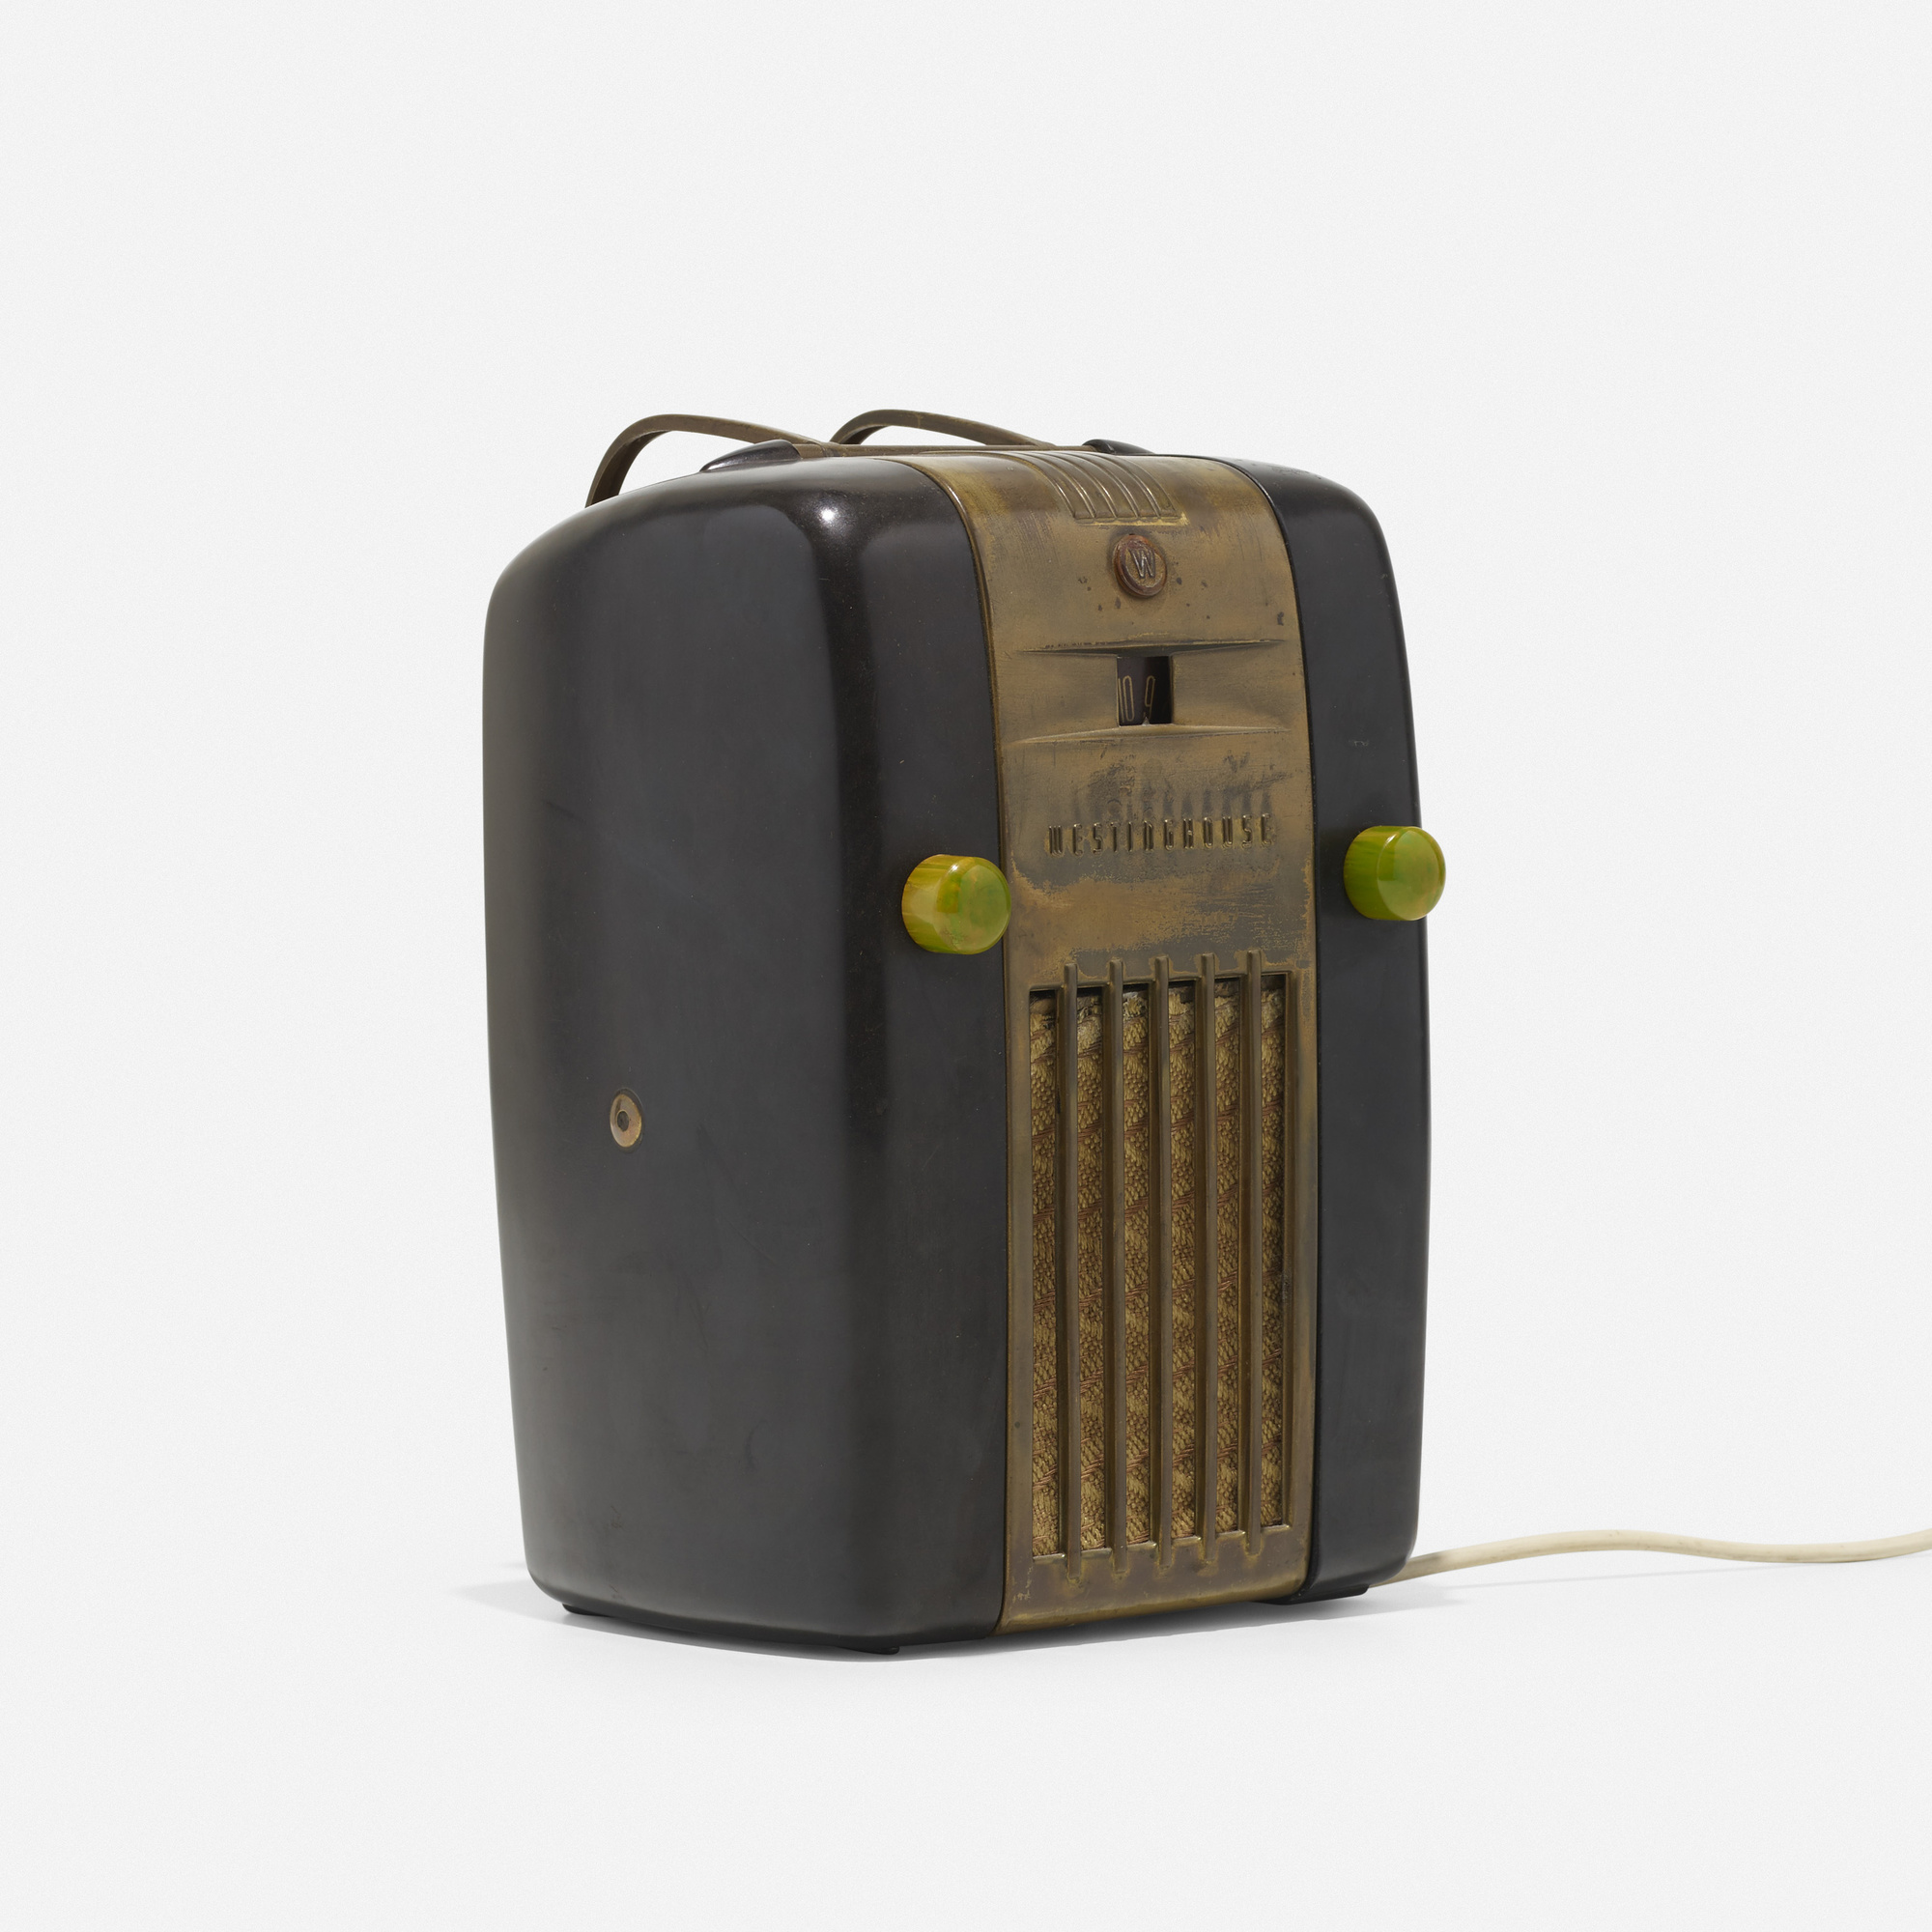 160: Westinghouse / radio, model H-126 (1 of 2)